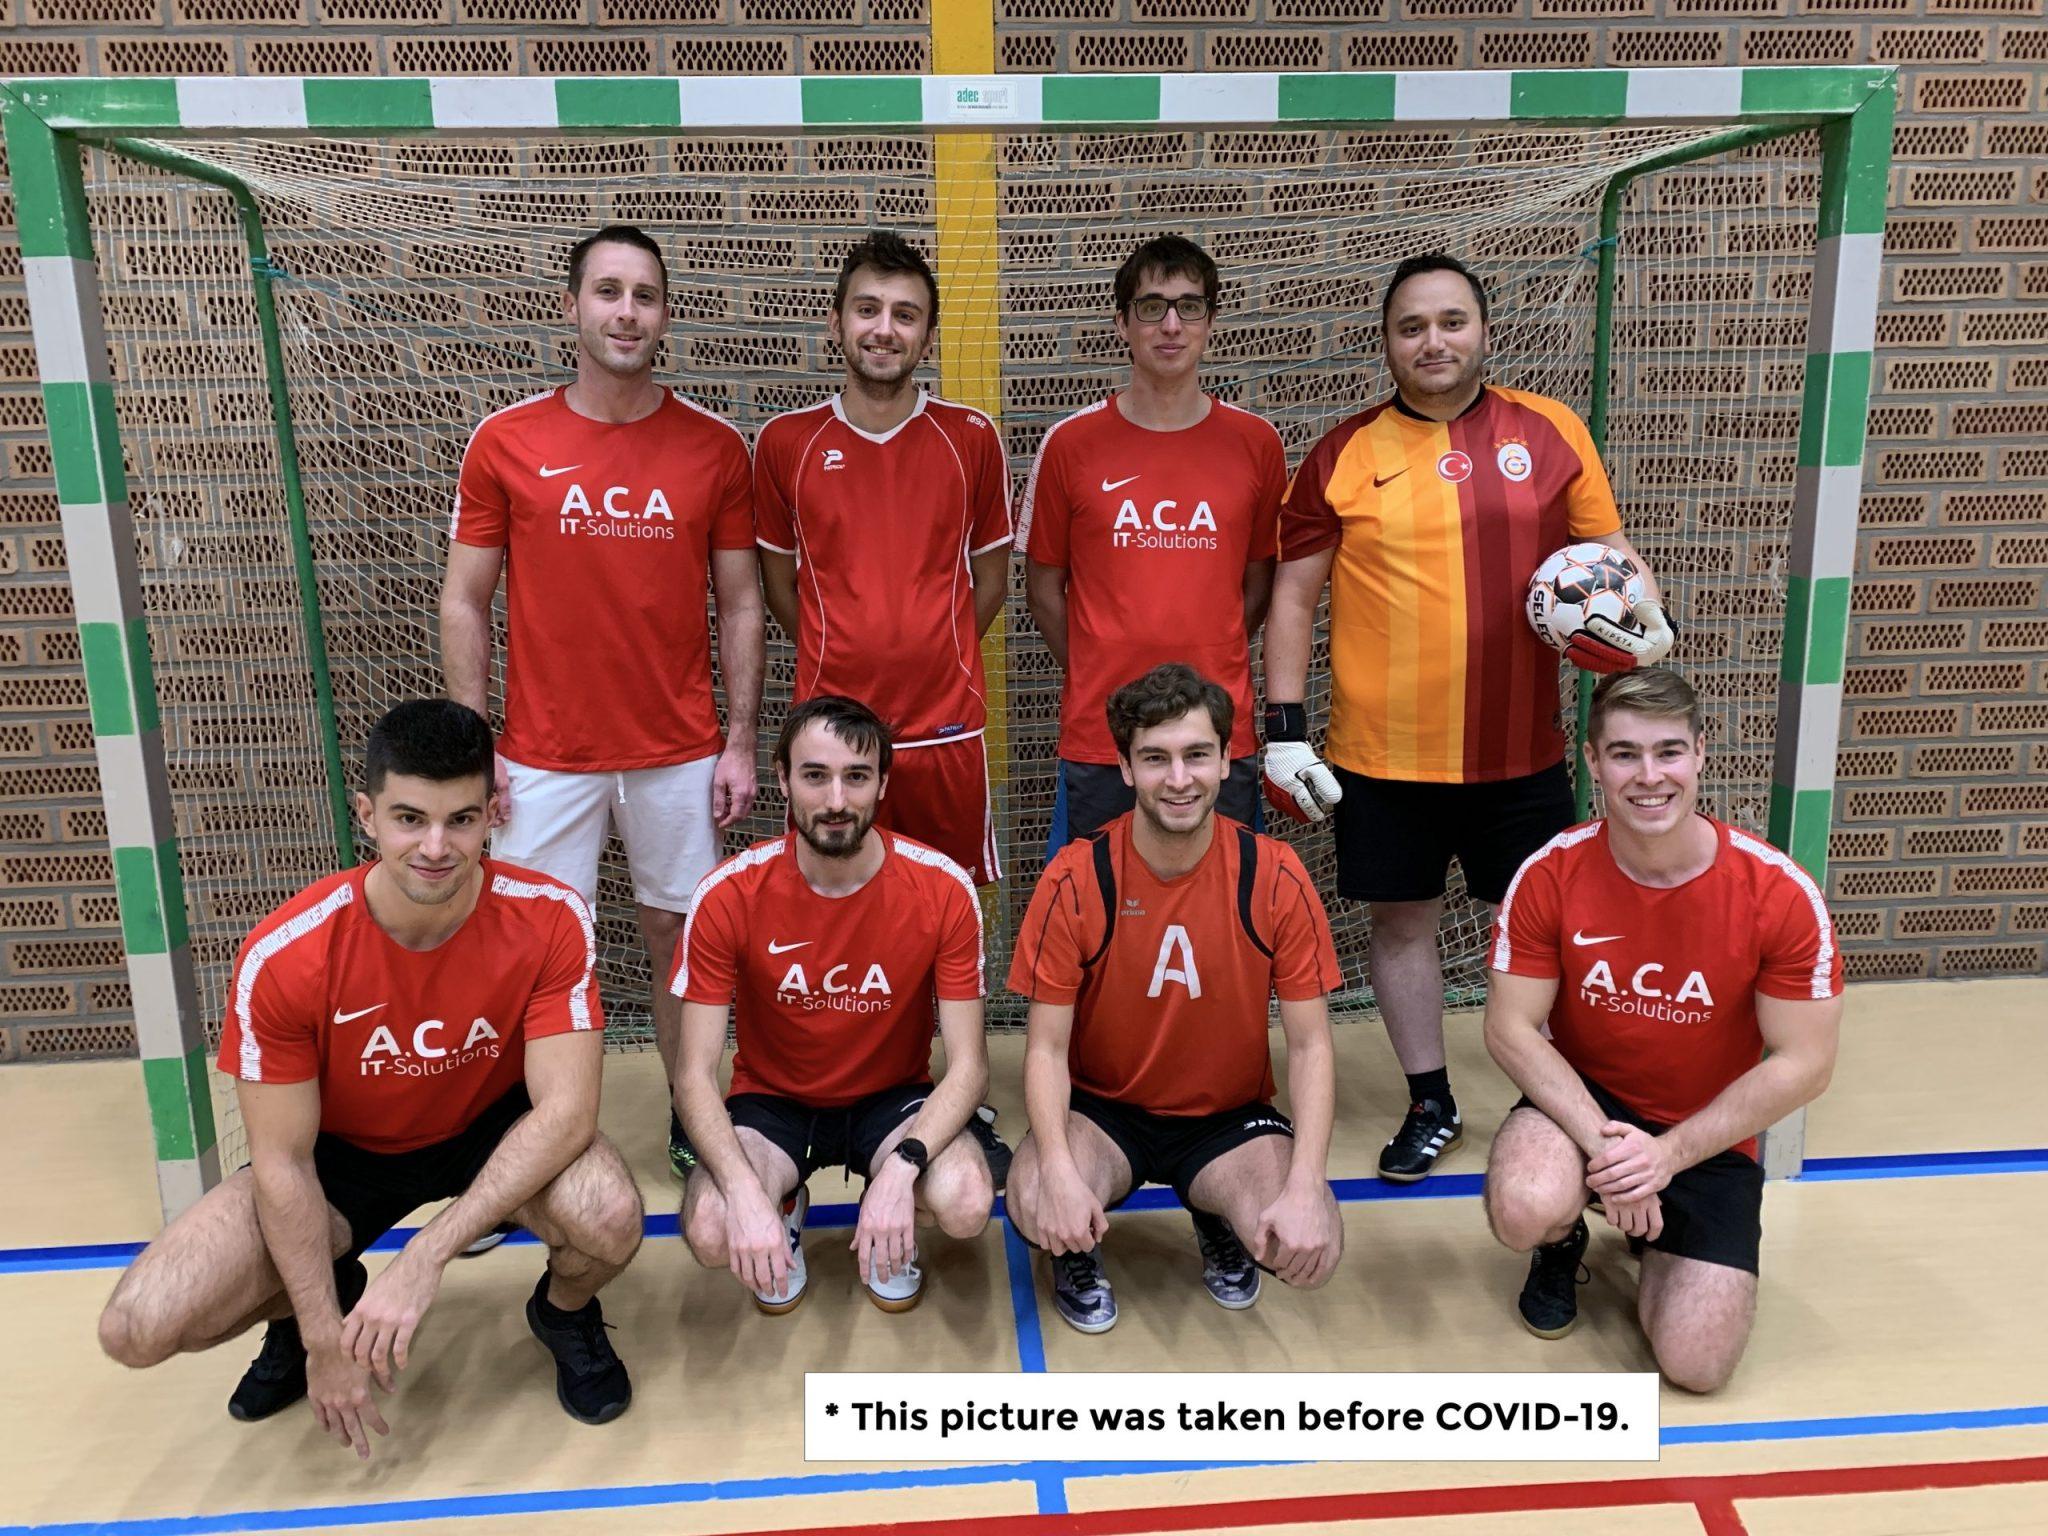 The ACA fusbal team